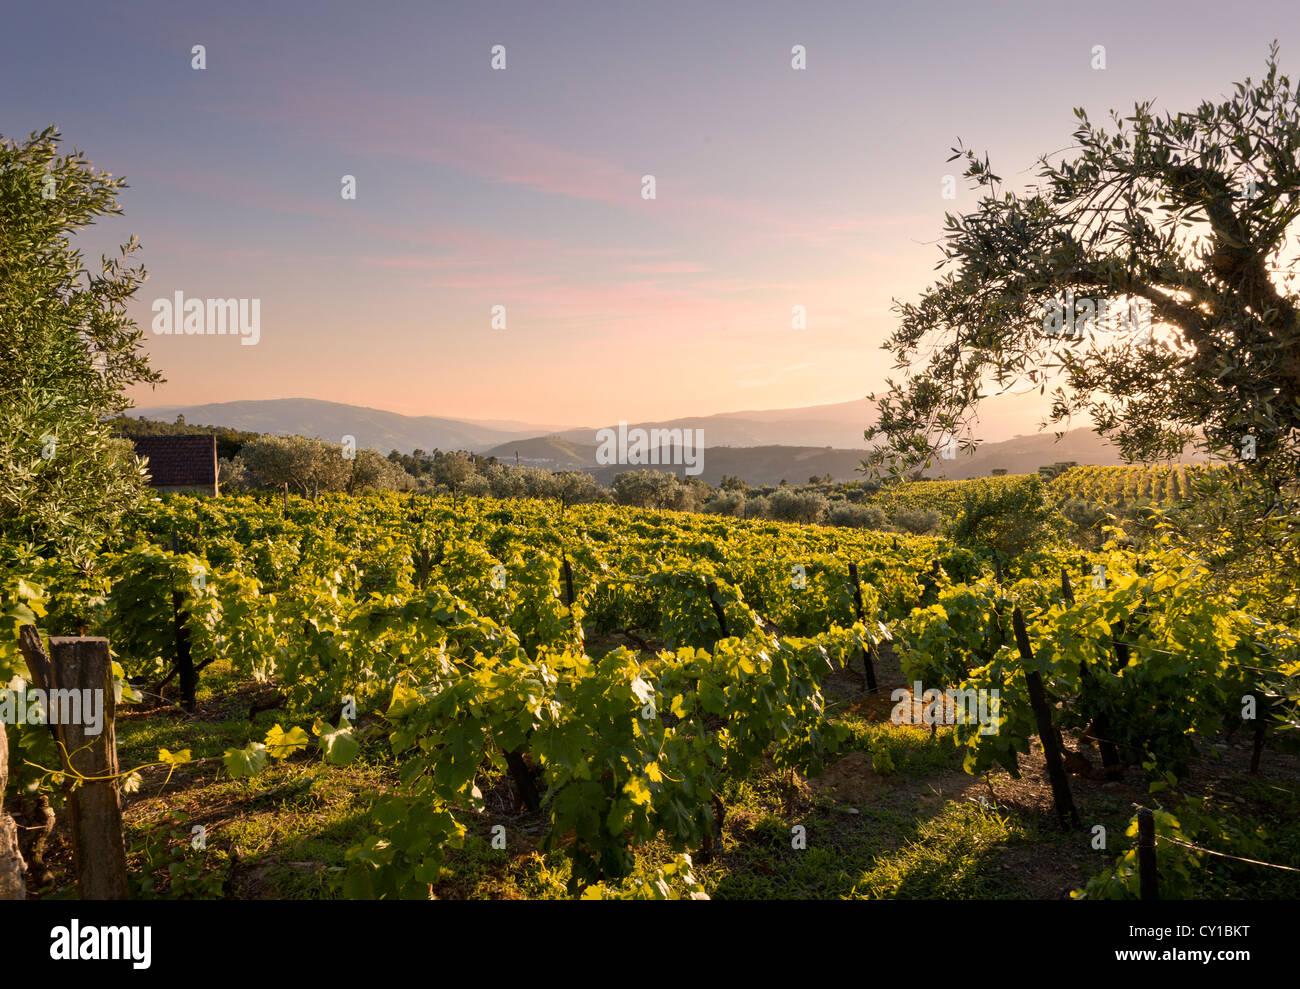 Portugal, the Alto Douro, vineyards near Peso da Régua - Stock Image